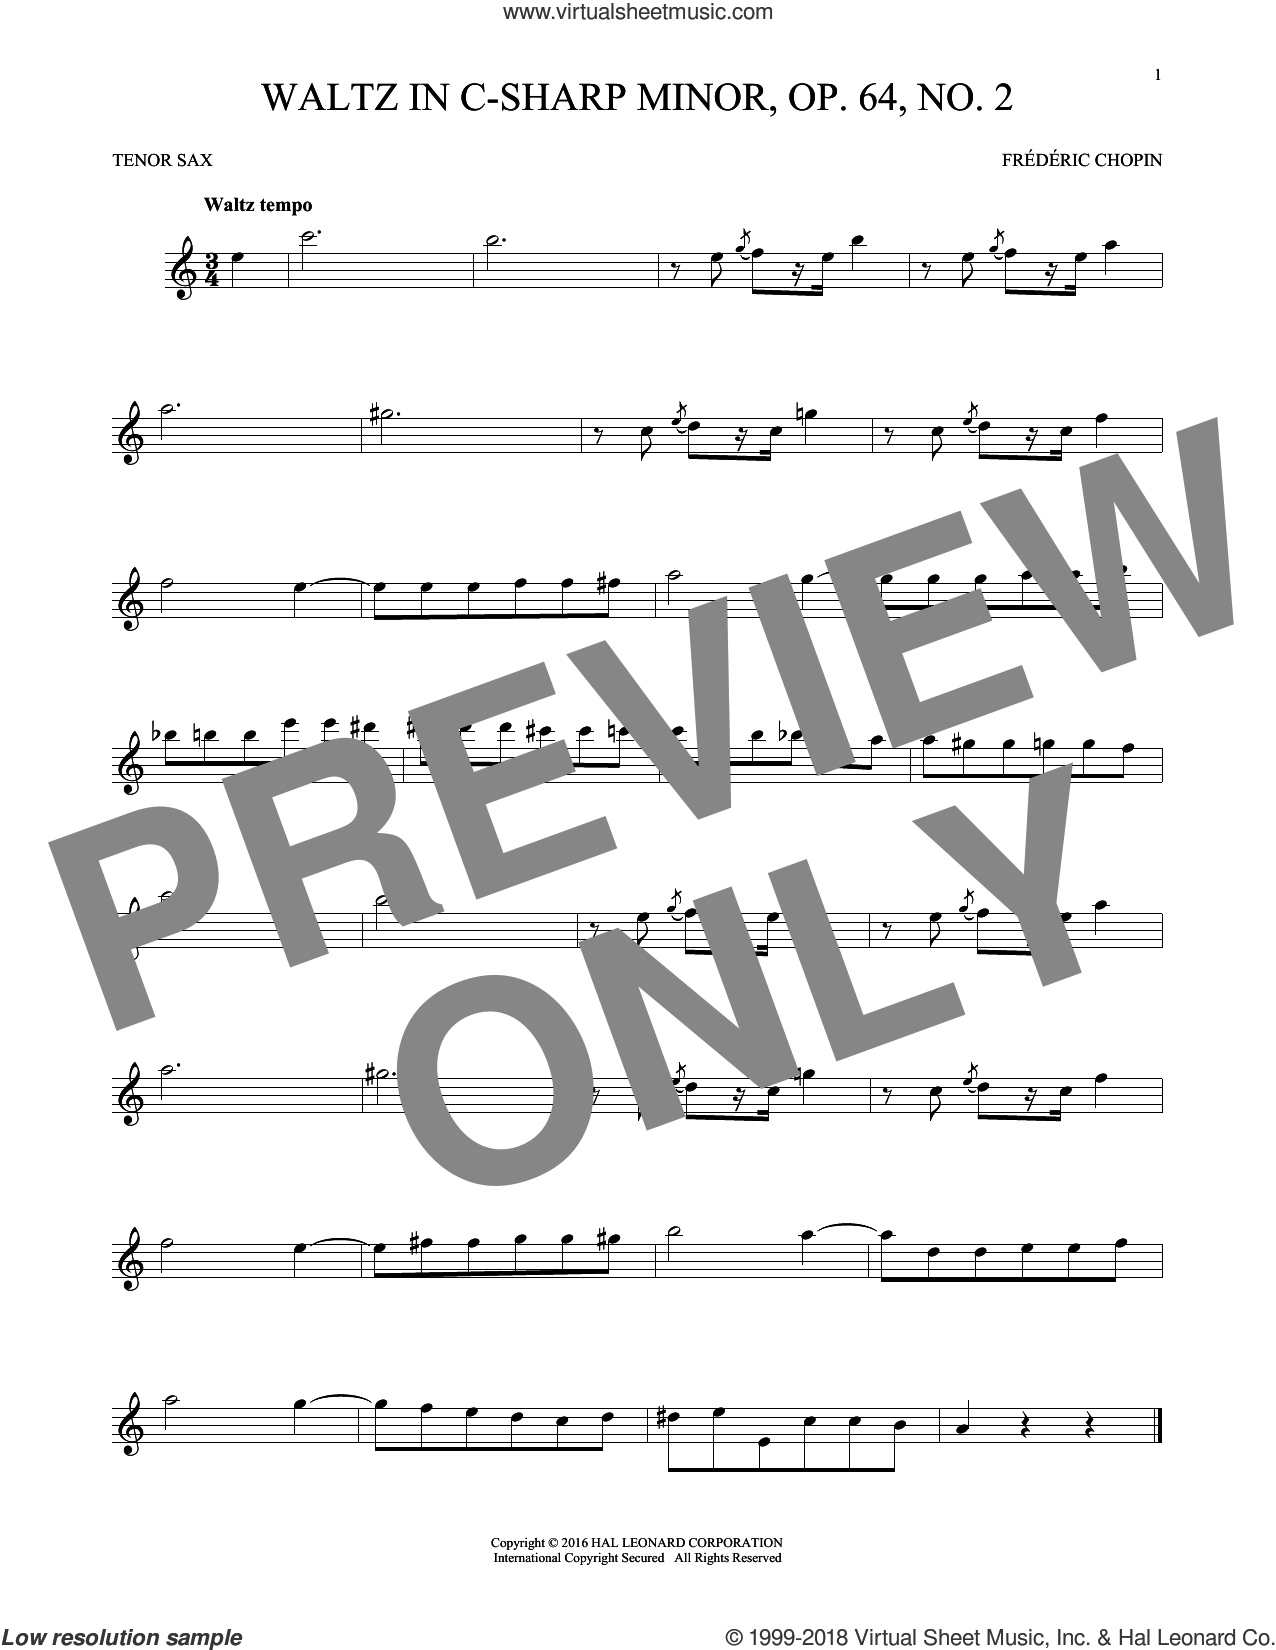 Waltz In C-Sharp Minor, Op. 64, No. 2 sheet music for tenor saxophone solo by Frederic Chopin, classical score, intermediate skill level